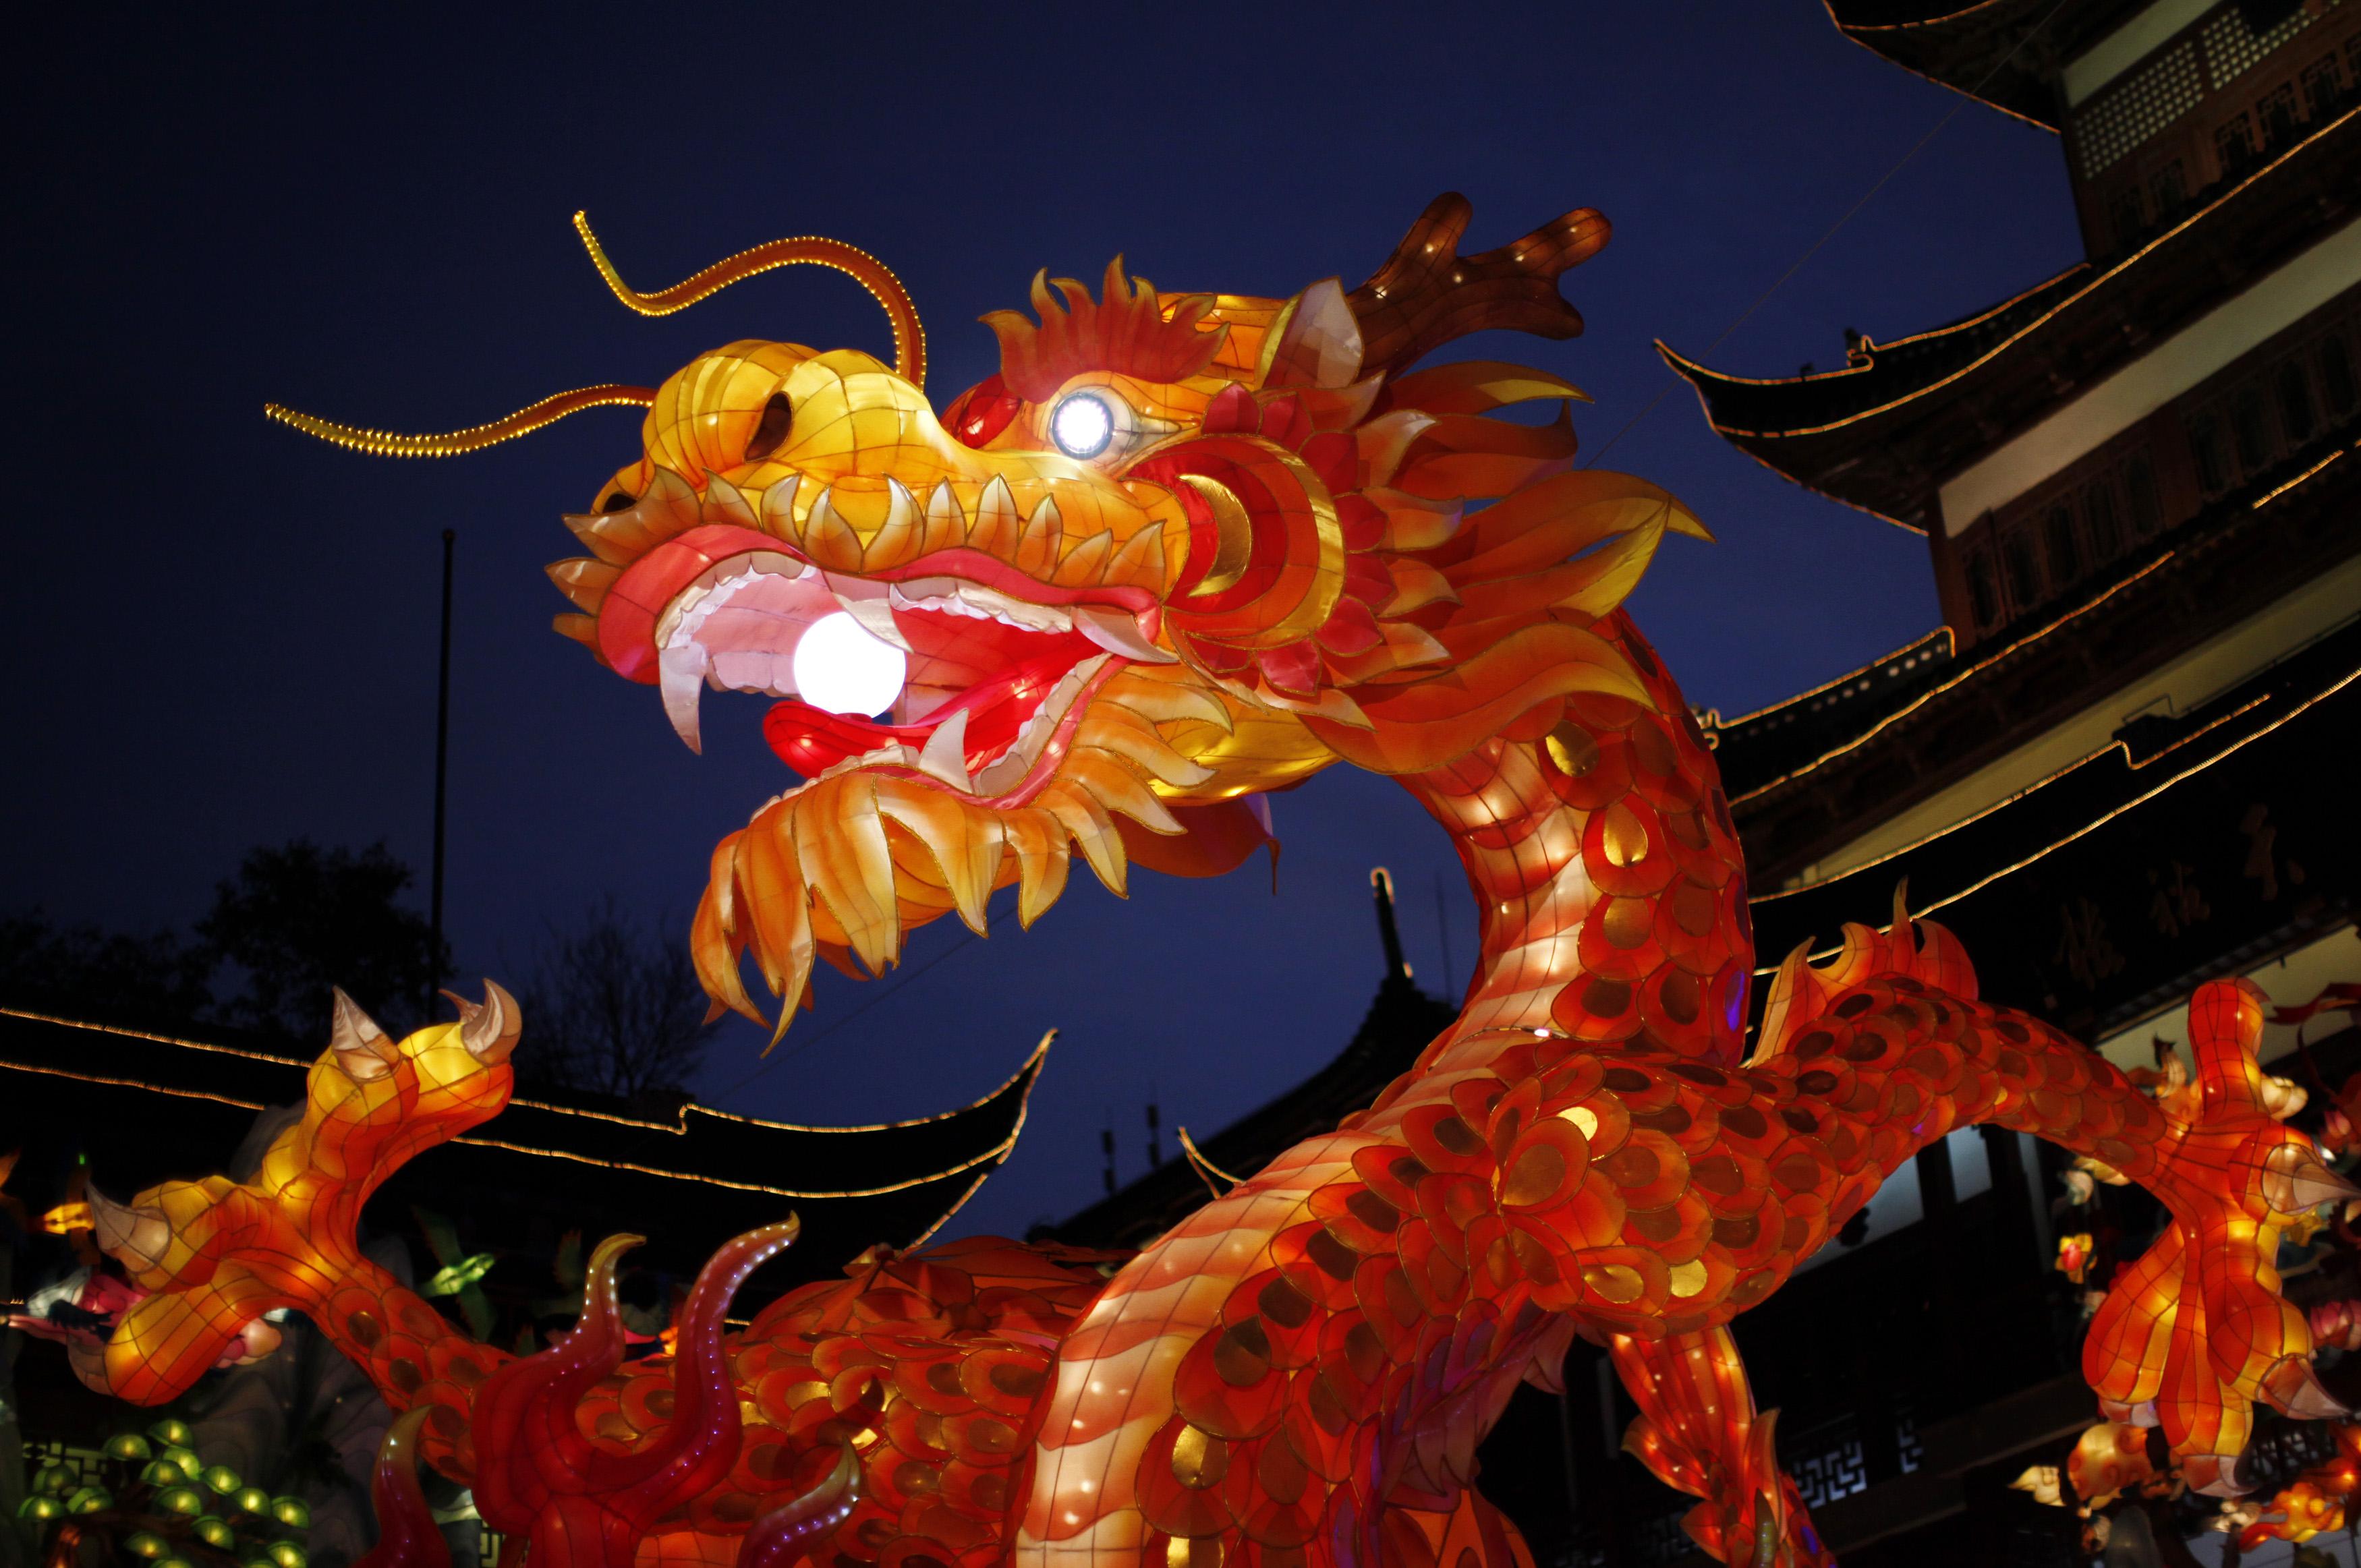 A dragon lantern is seen at Yuyuan Garden in downtown Shanghai January 17, 2012. REUTERS/Carlos Barria